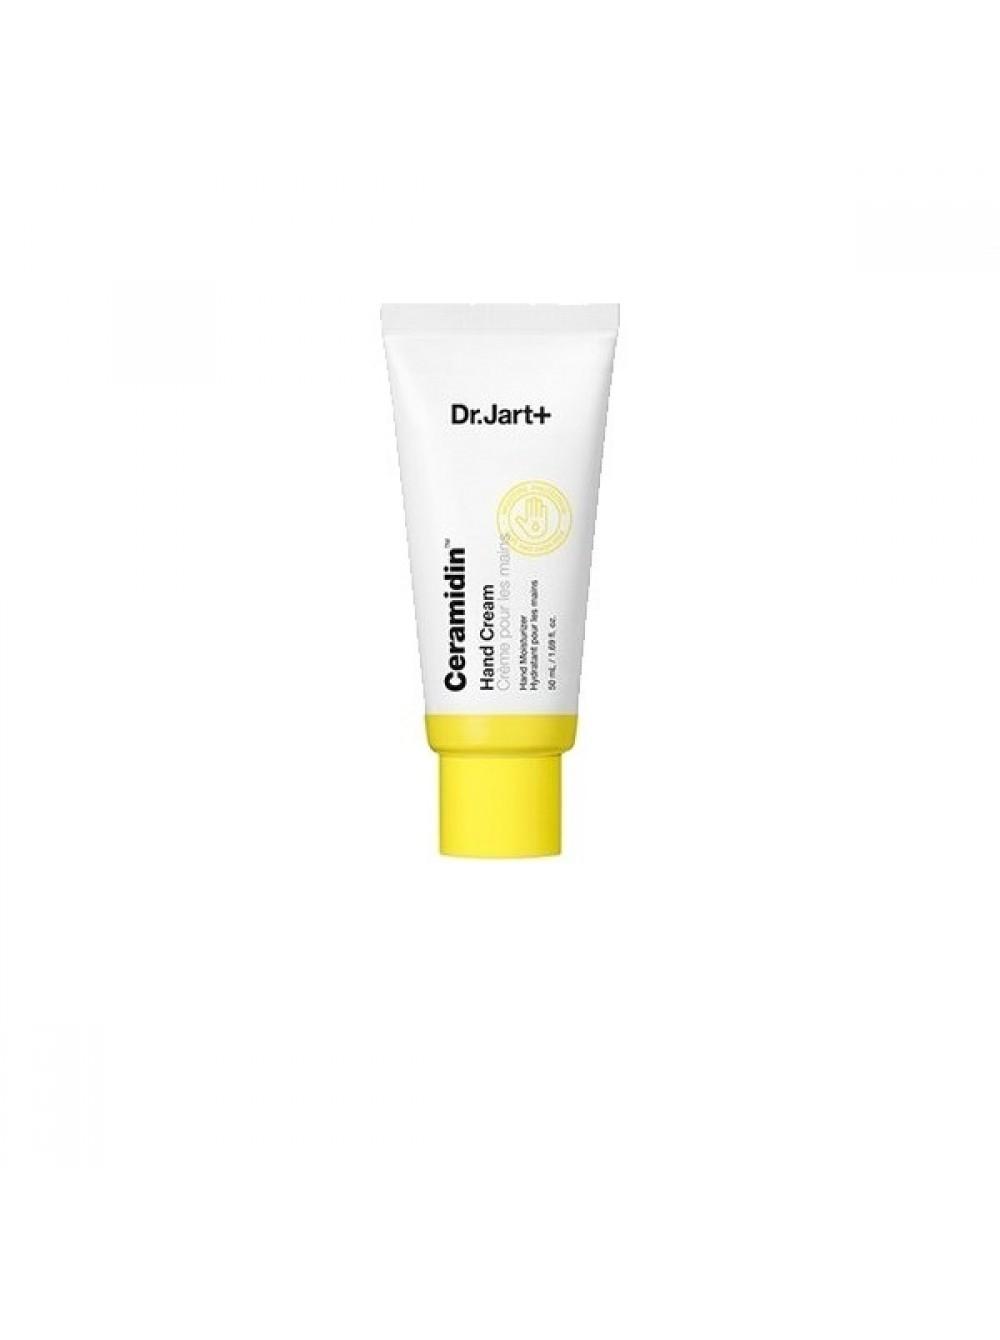 Dr.Jart+ Крем для Рук Ceramidin Hand Cream, 50 мл neutrogena крем для рук антивозрастной age shield hand cream 50 мл